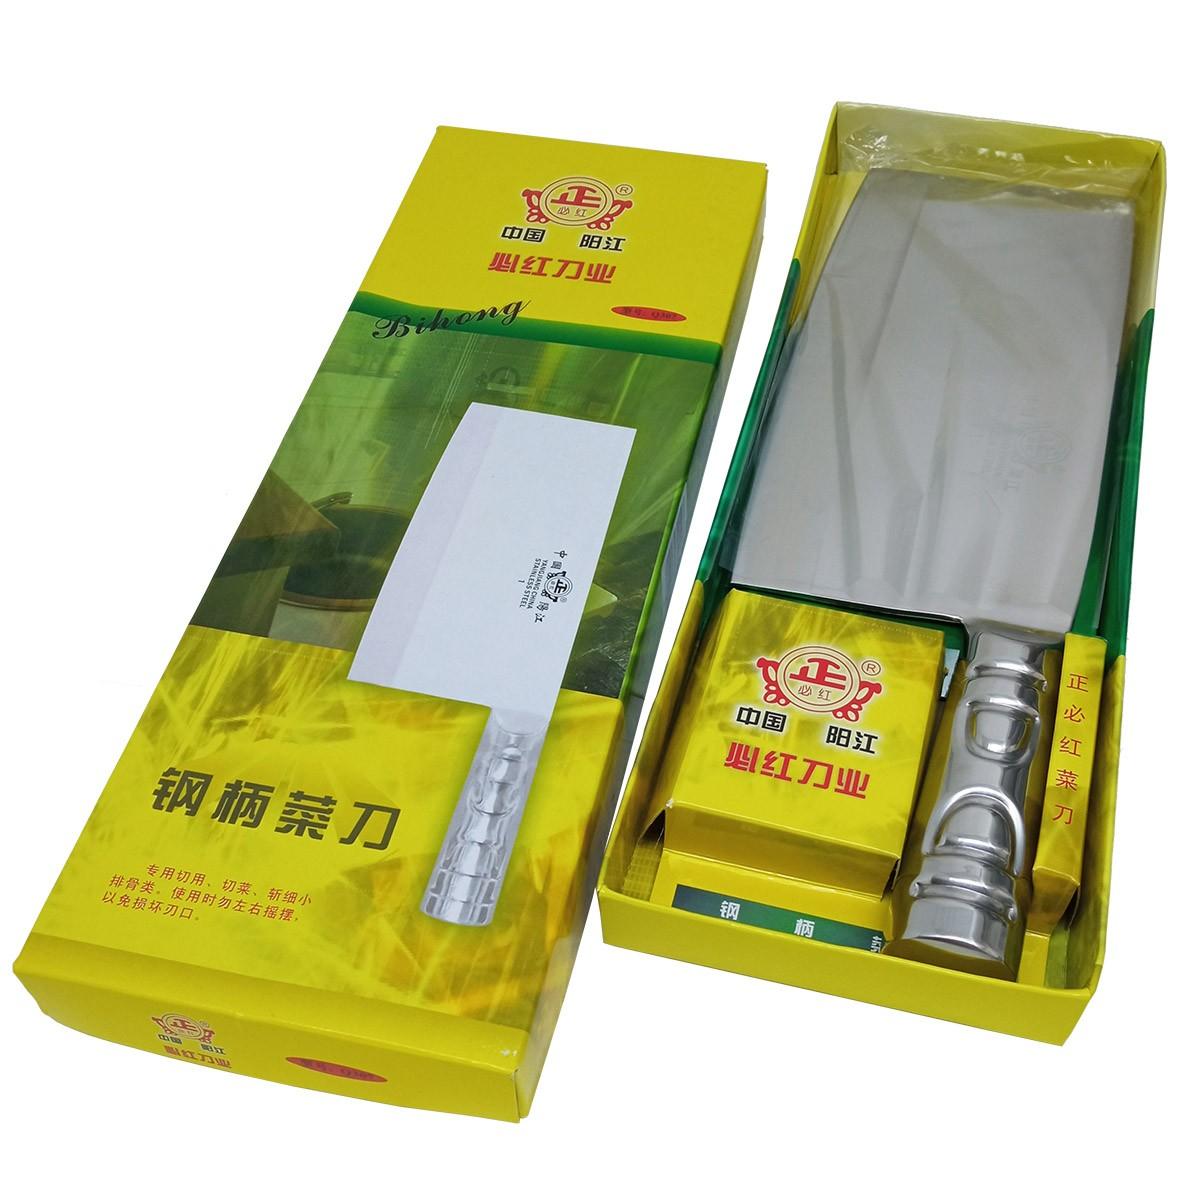 Faca Cutelo Chinês Original Aço Inoxidável 20cm Yangjiang